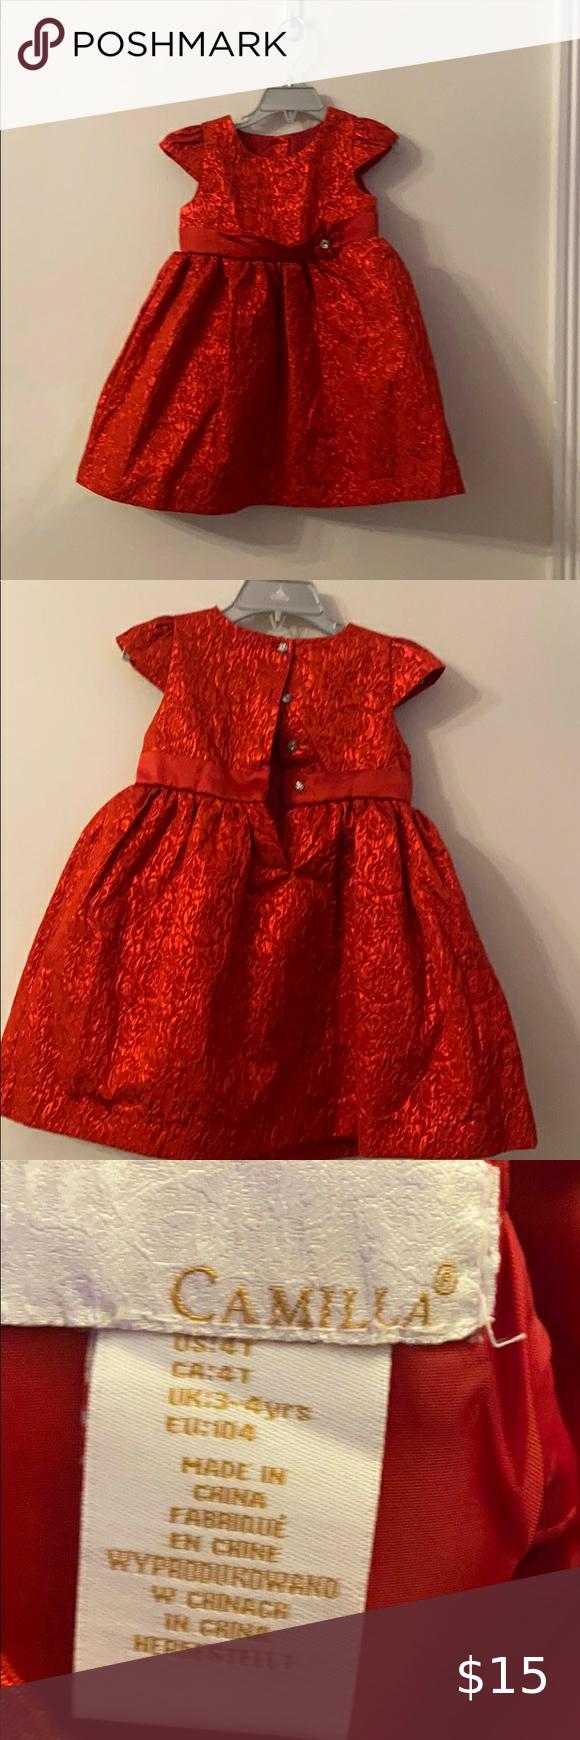 Camilla Red Dress Size 4t Red Dress Beautiful Red Dresses Dresses [ 1740 x 580 Pixel ]